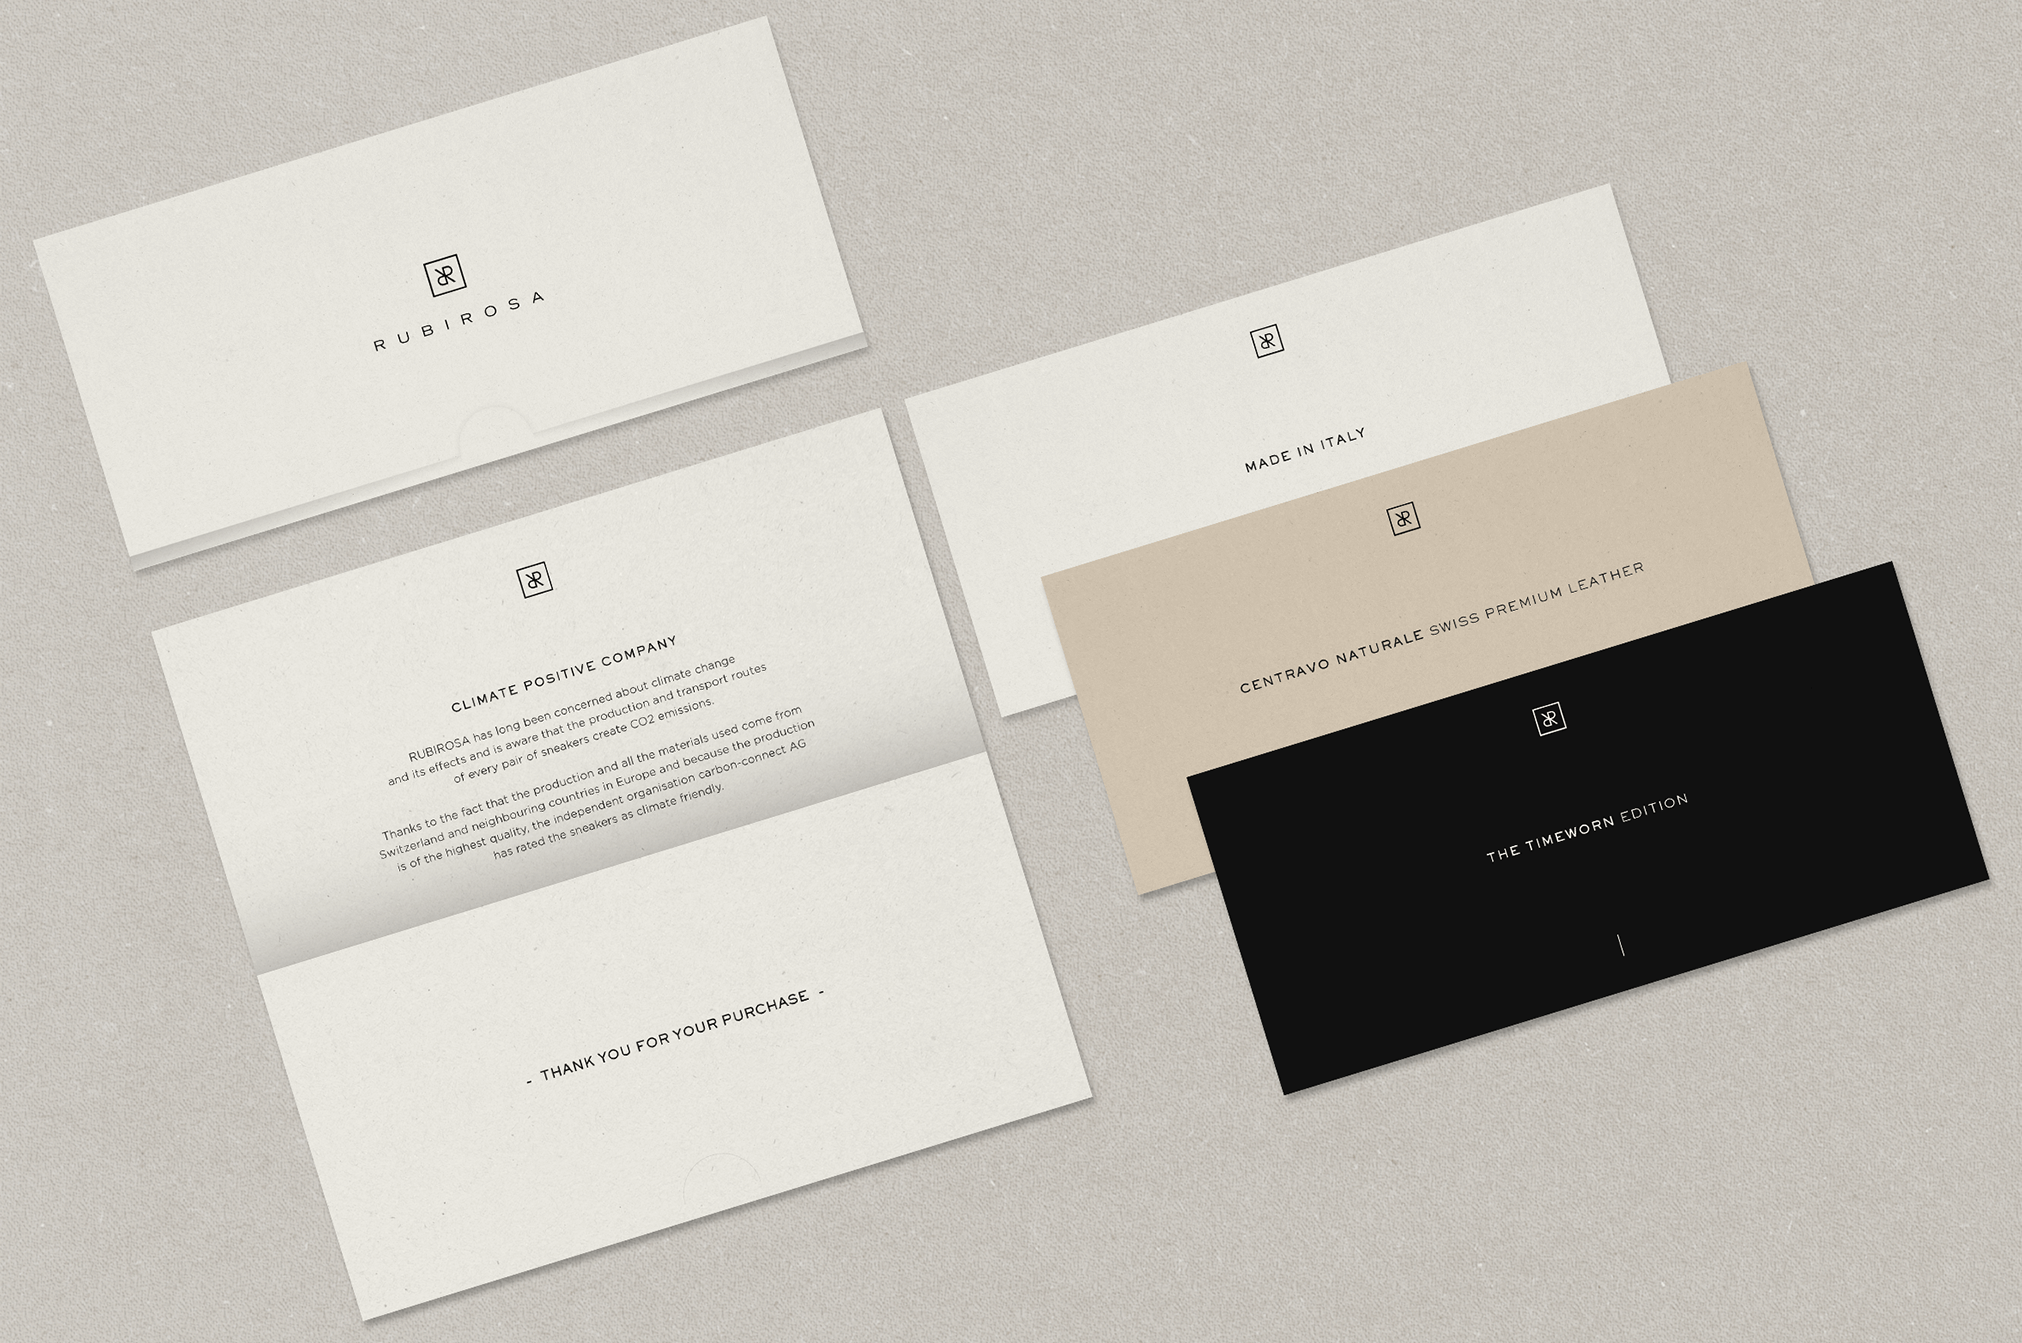 RUBIROSA_mockup-cards_02